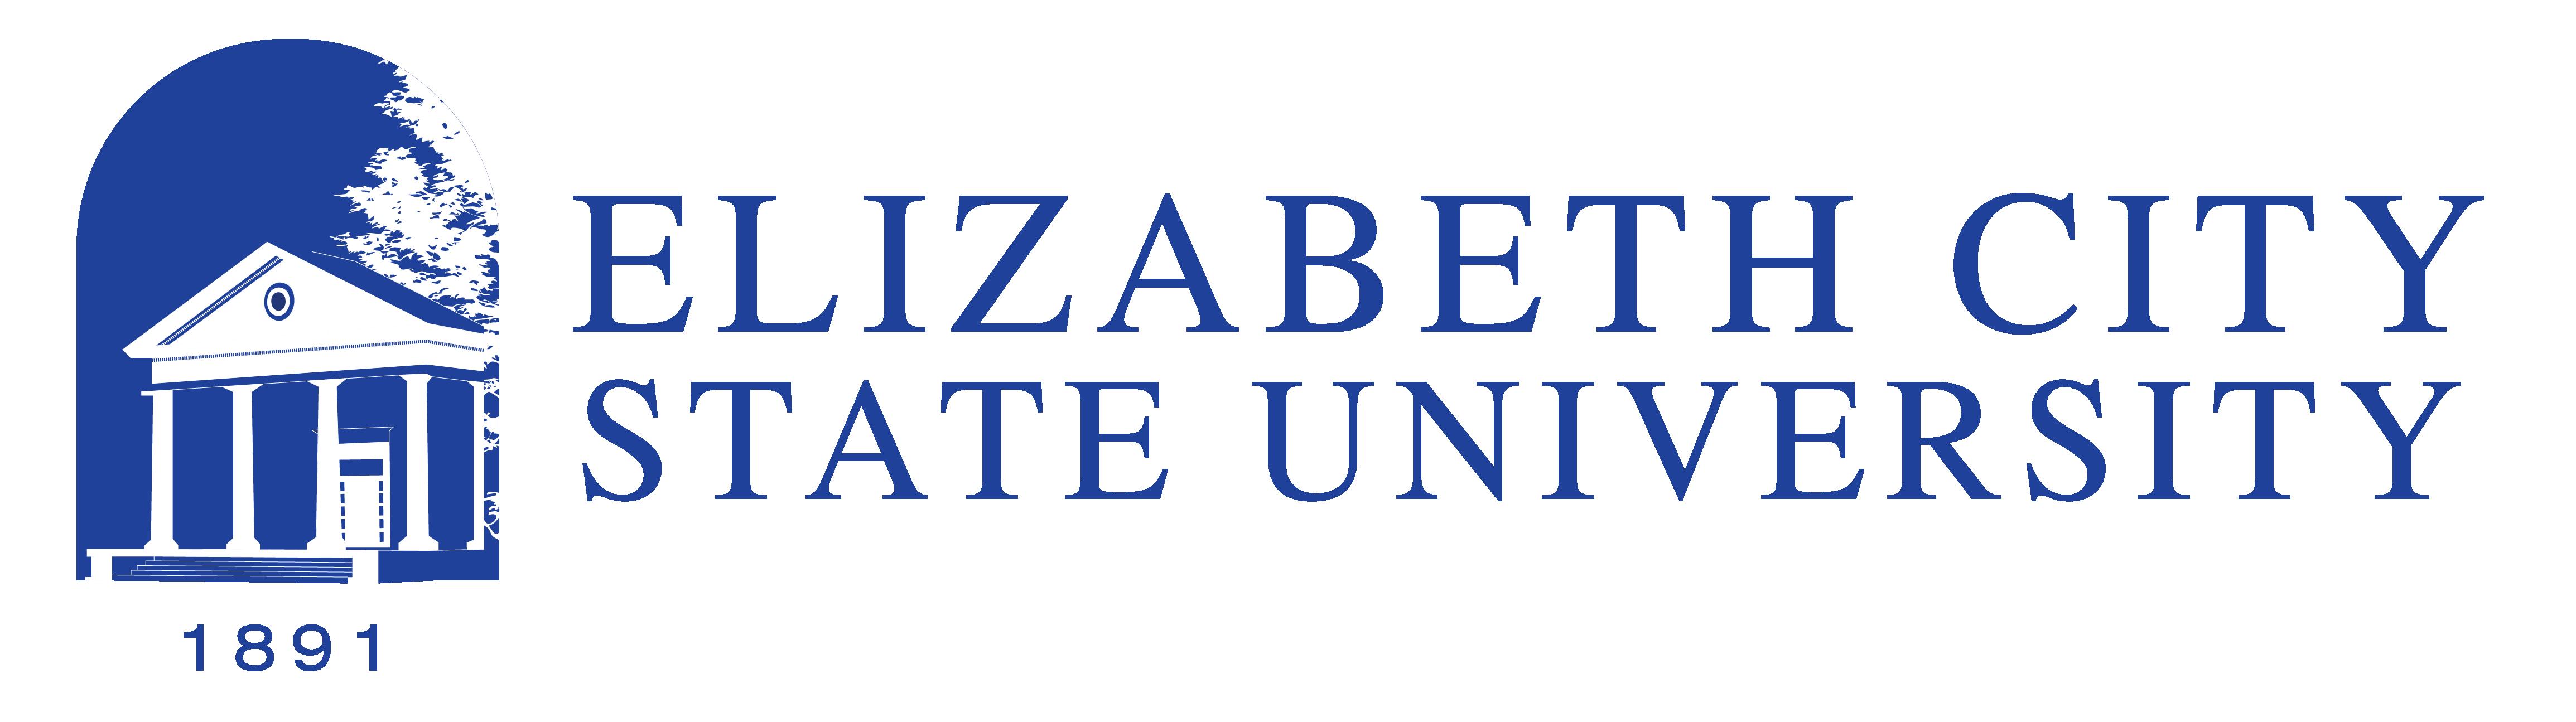 Elizabeth City State University transfer information